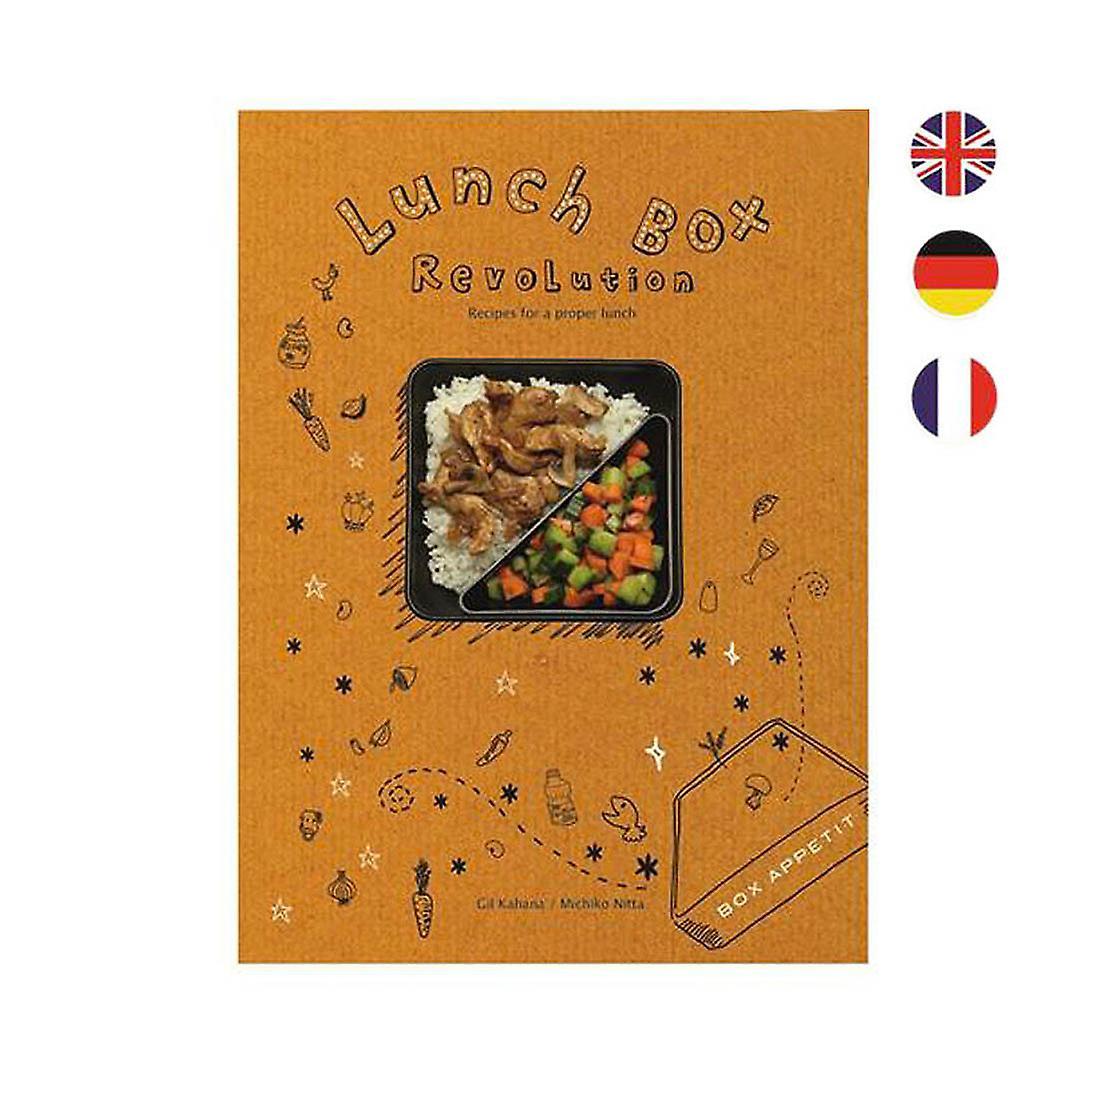 German Lunchbox Box Appetit Cook Book by Black & Blum